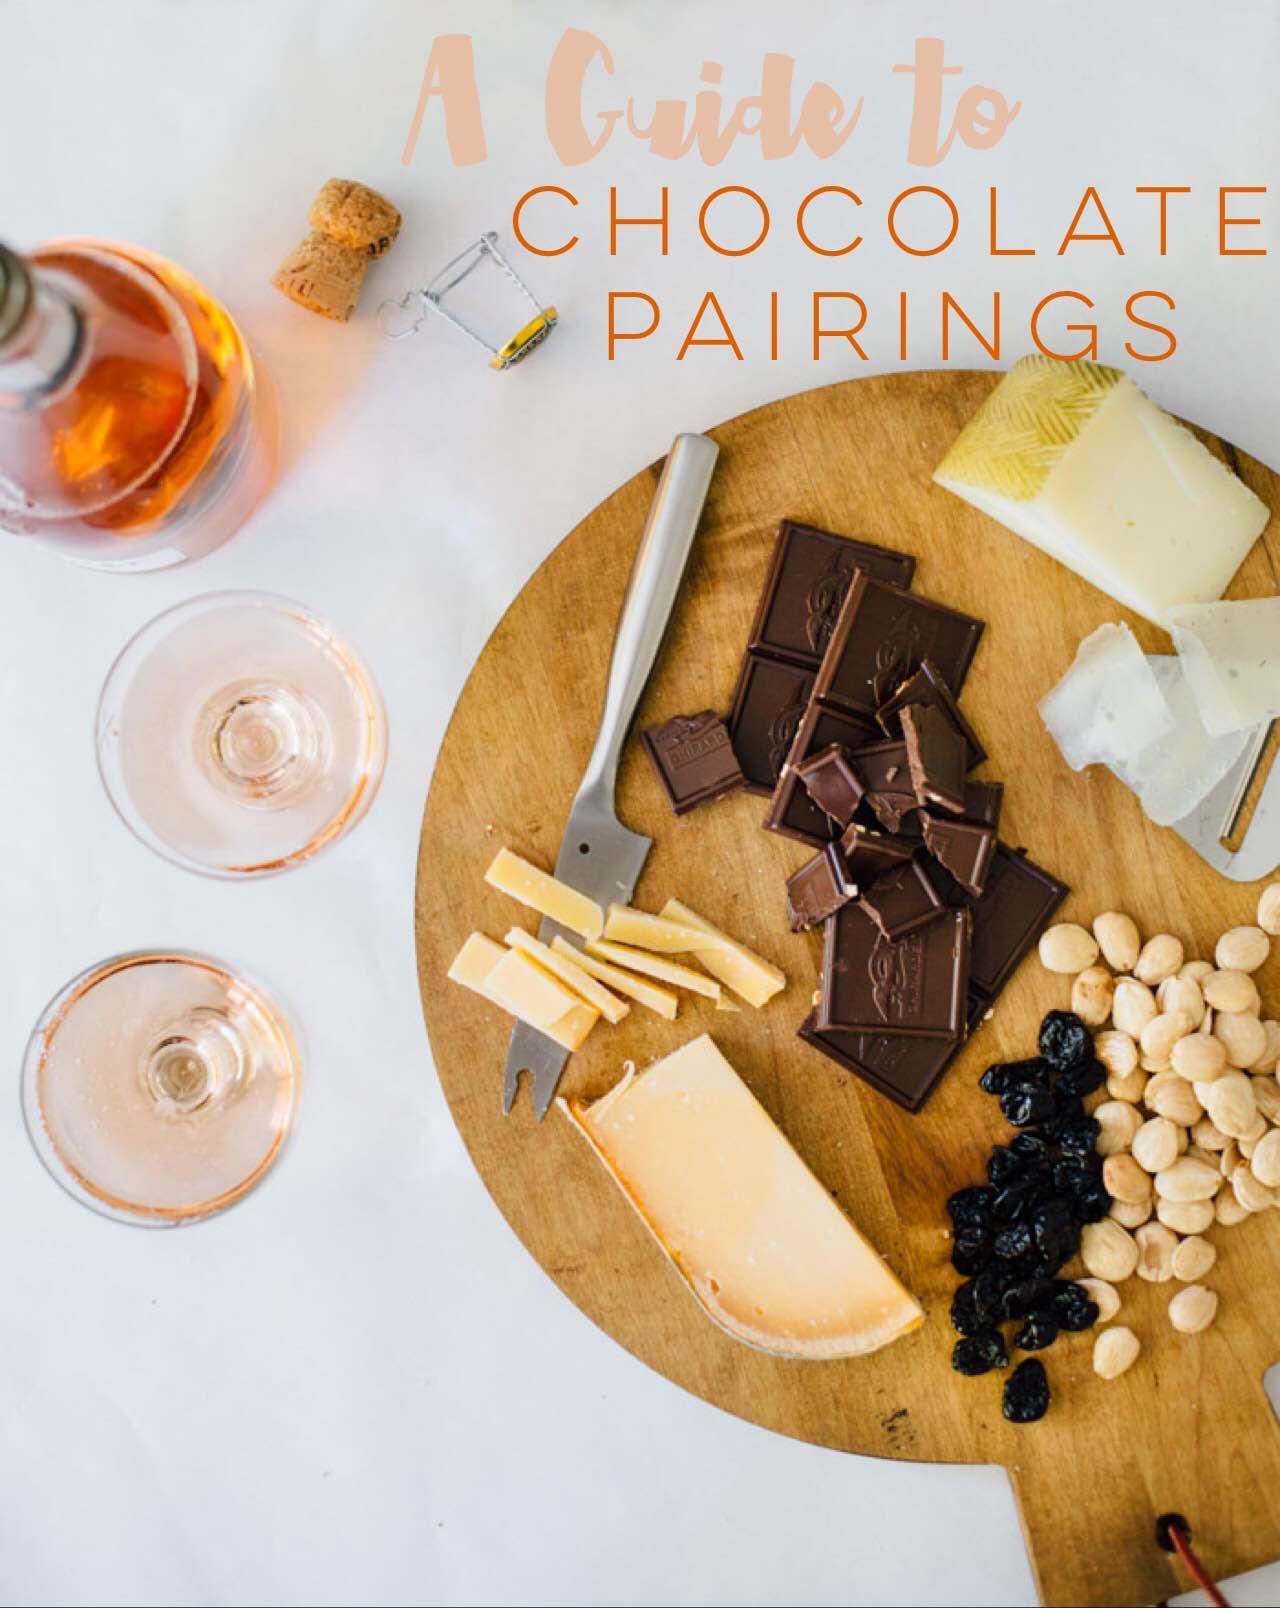 How To Pair Chocolate